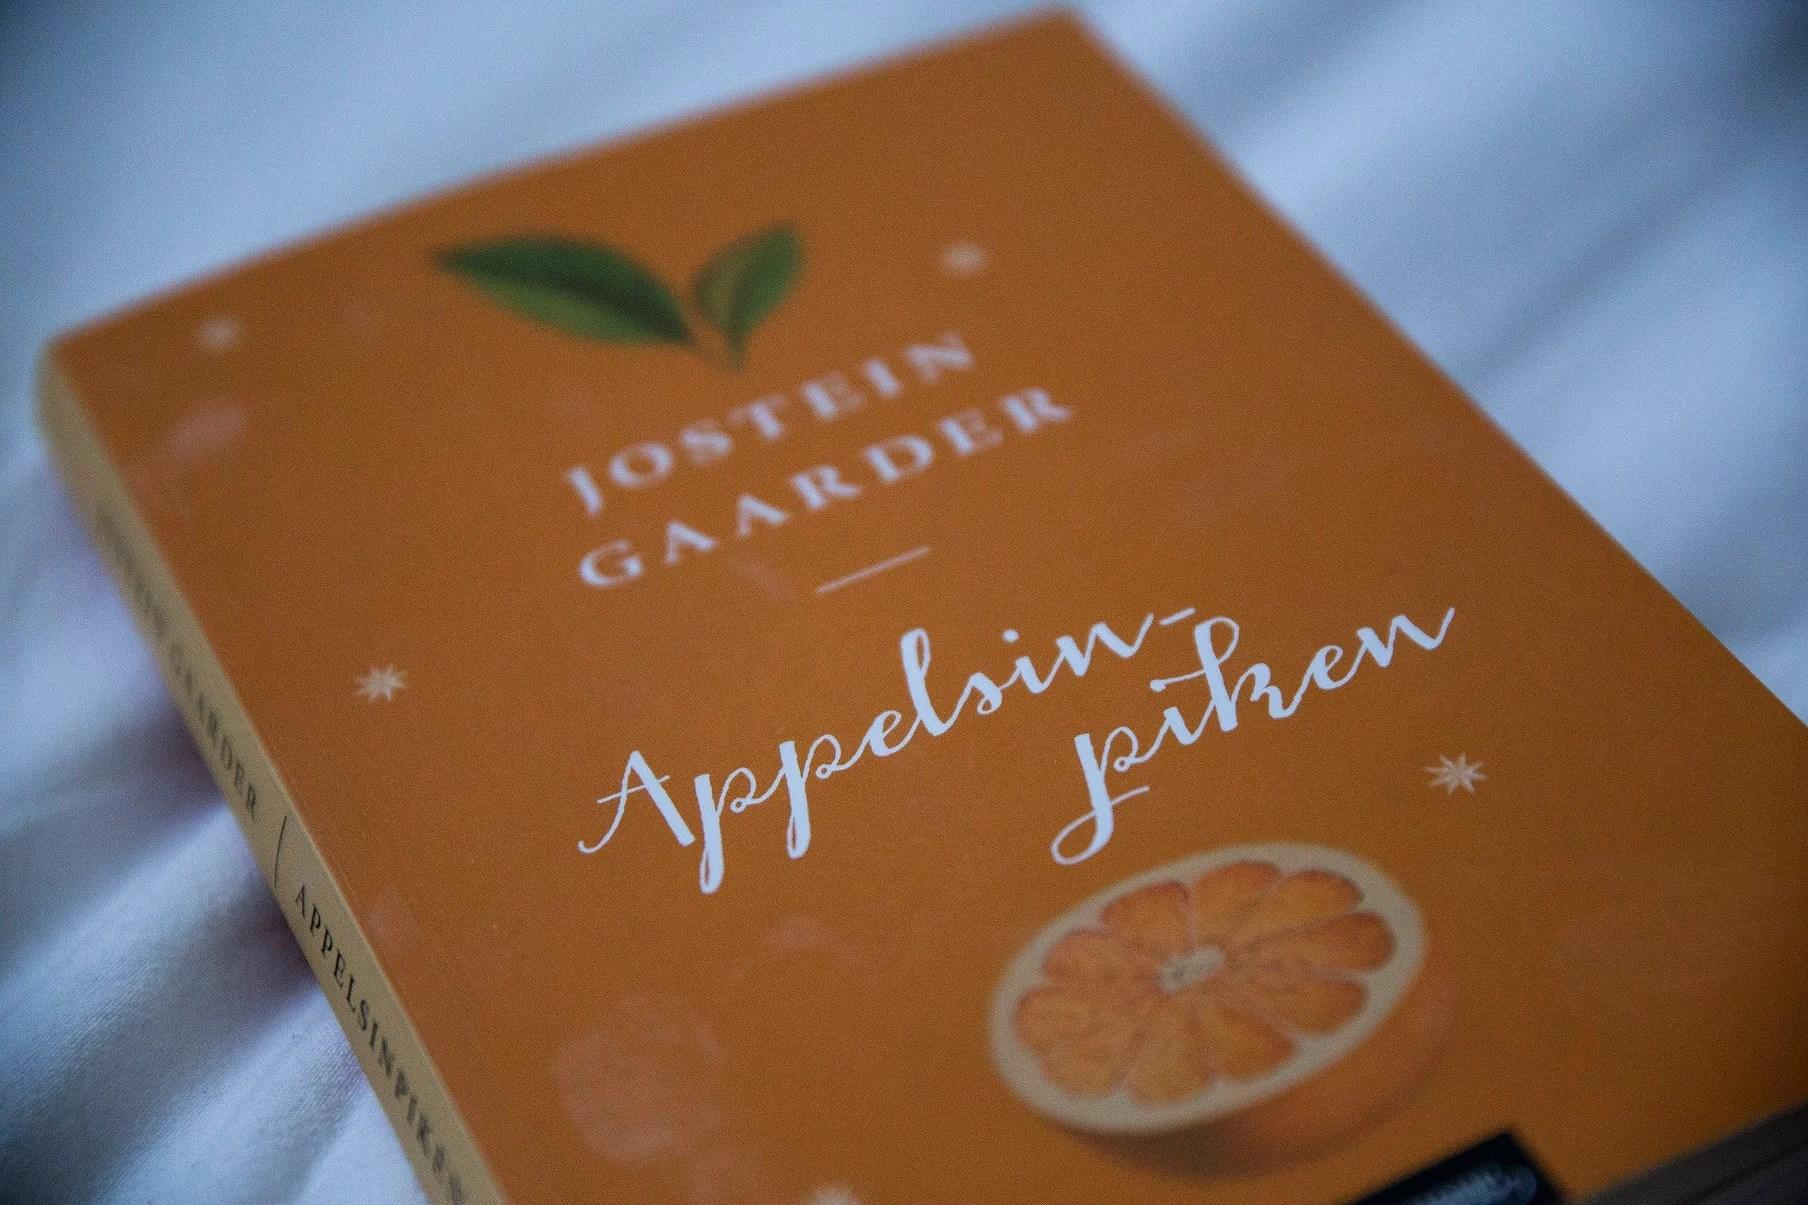 Appelsinpiken av Jostein Gaarder